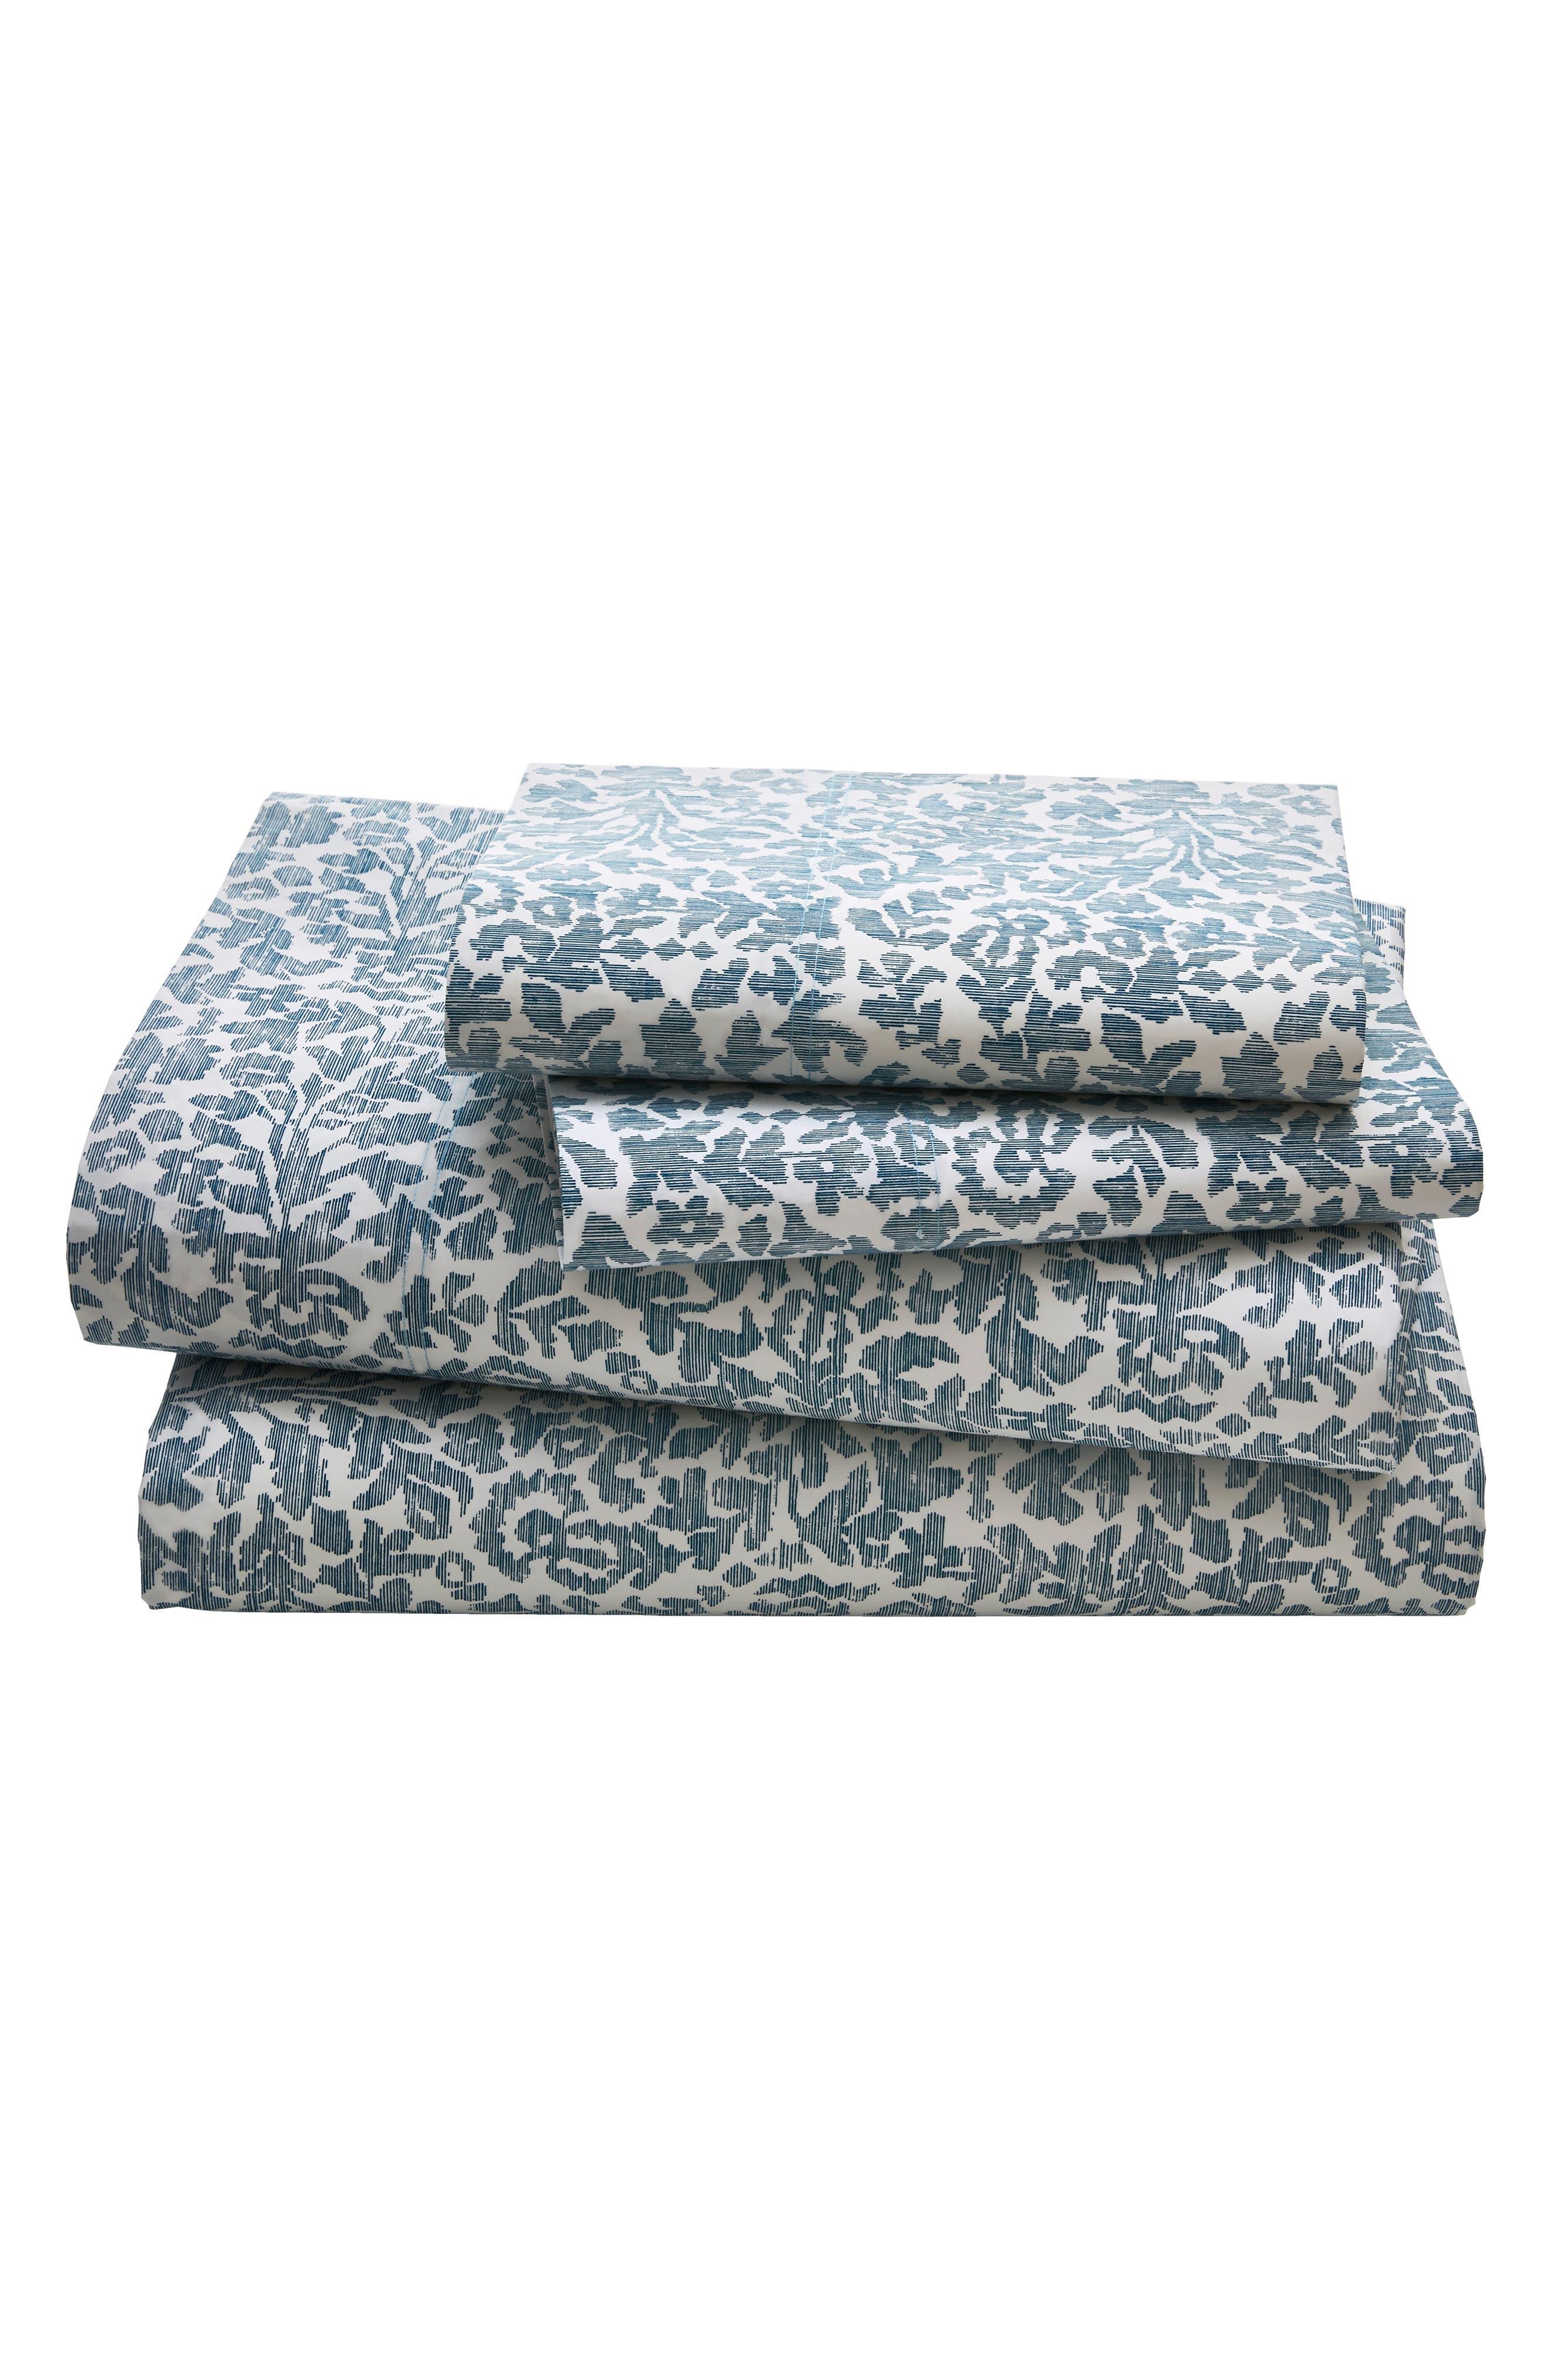 Oaxaca 300 Thread Count Sheet Set,                         Main,                         color, Azure/ Turquoise/ Aqua